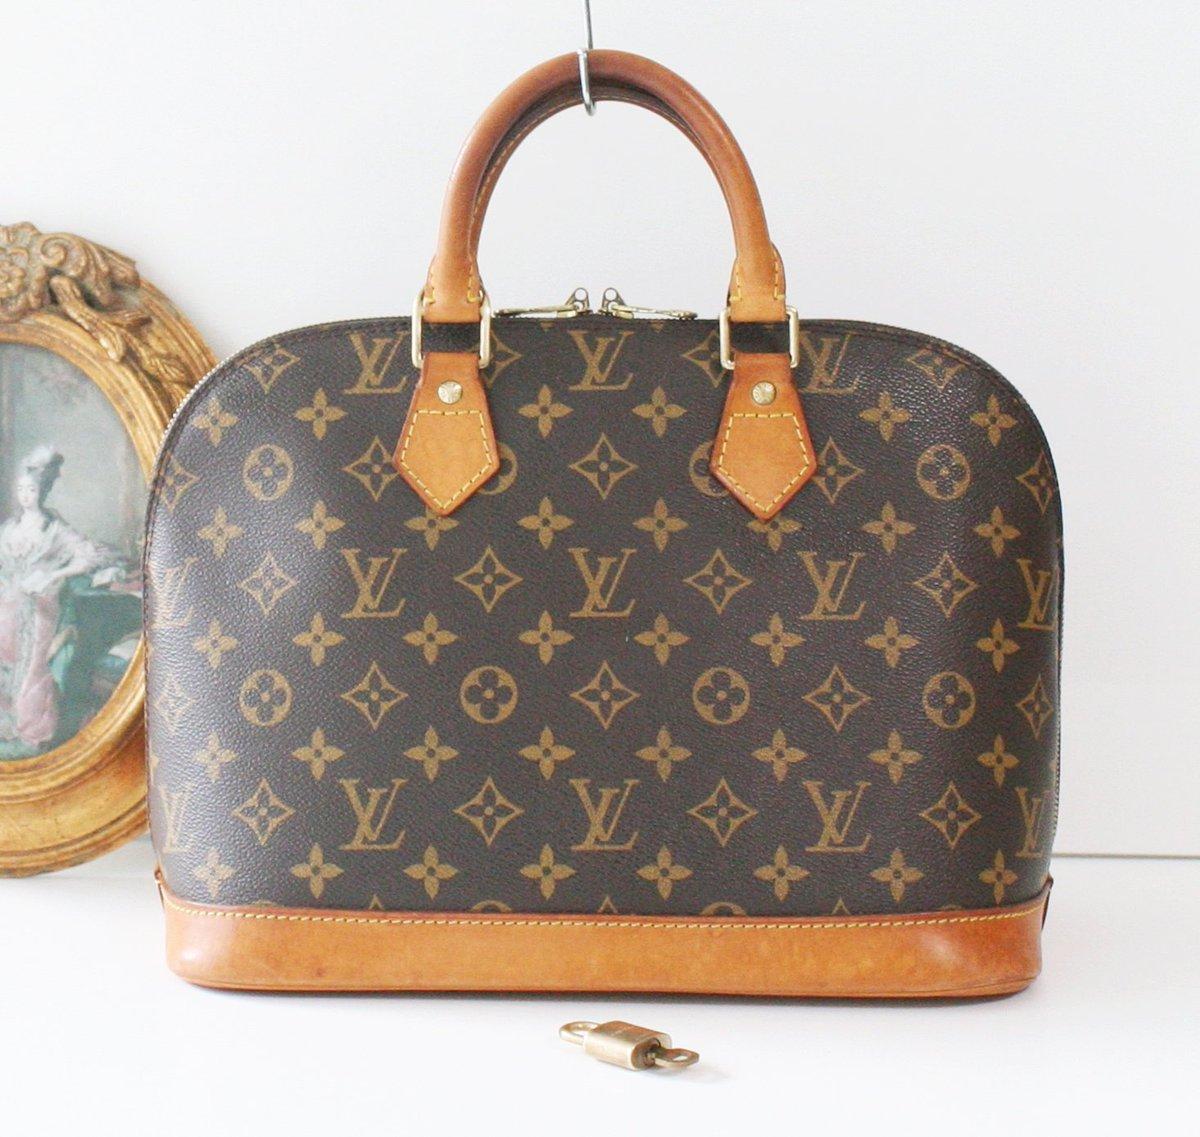 fc5024a975e ... addition to my  etsy shop  Louis Vuitton Monogram Alma MM Brown Authentic  Vintage handbag purse https   etsy.me 2QPLrxo  bagsandpurses   shamelessadvteam ...